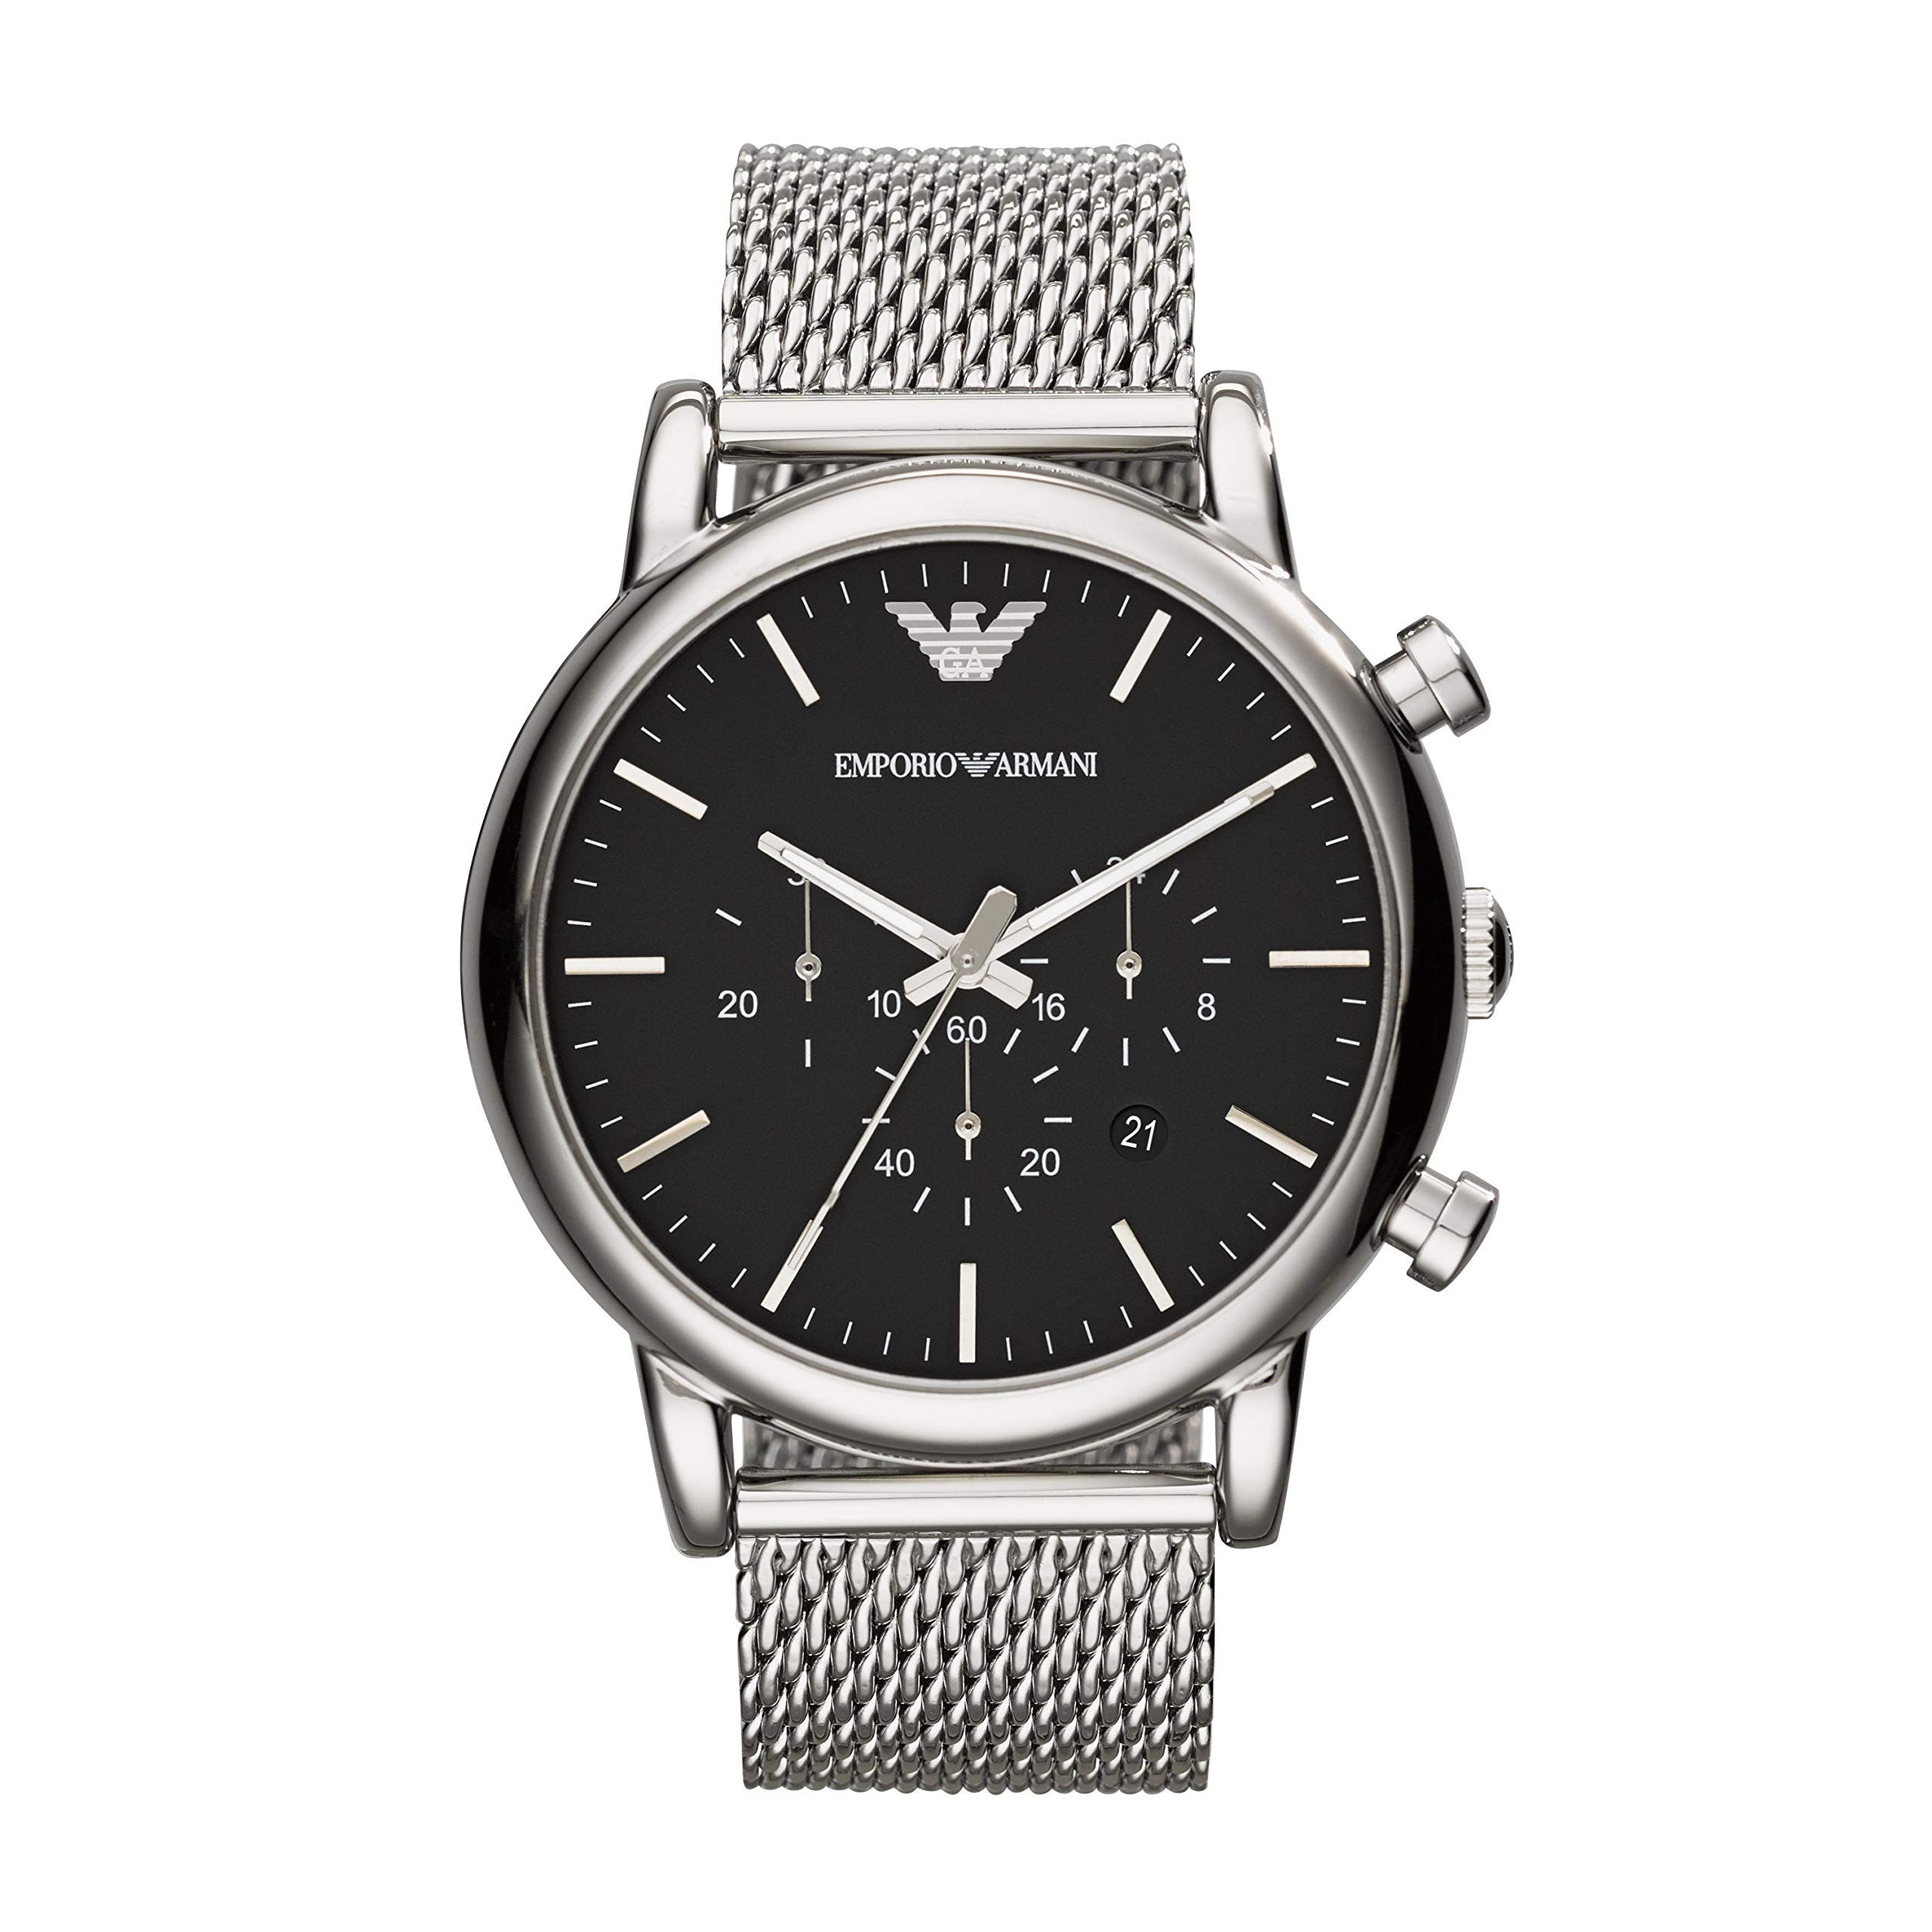 Emporio Armani Men's Chronograph Dress Watch With Quartz Movement